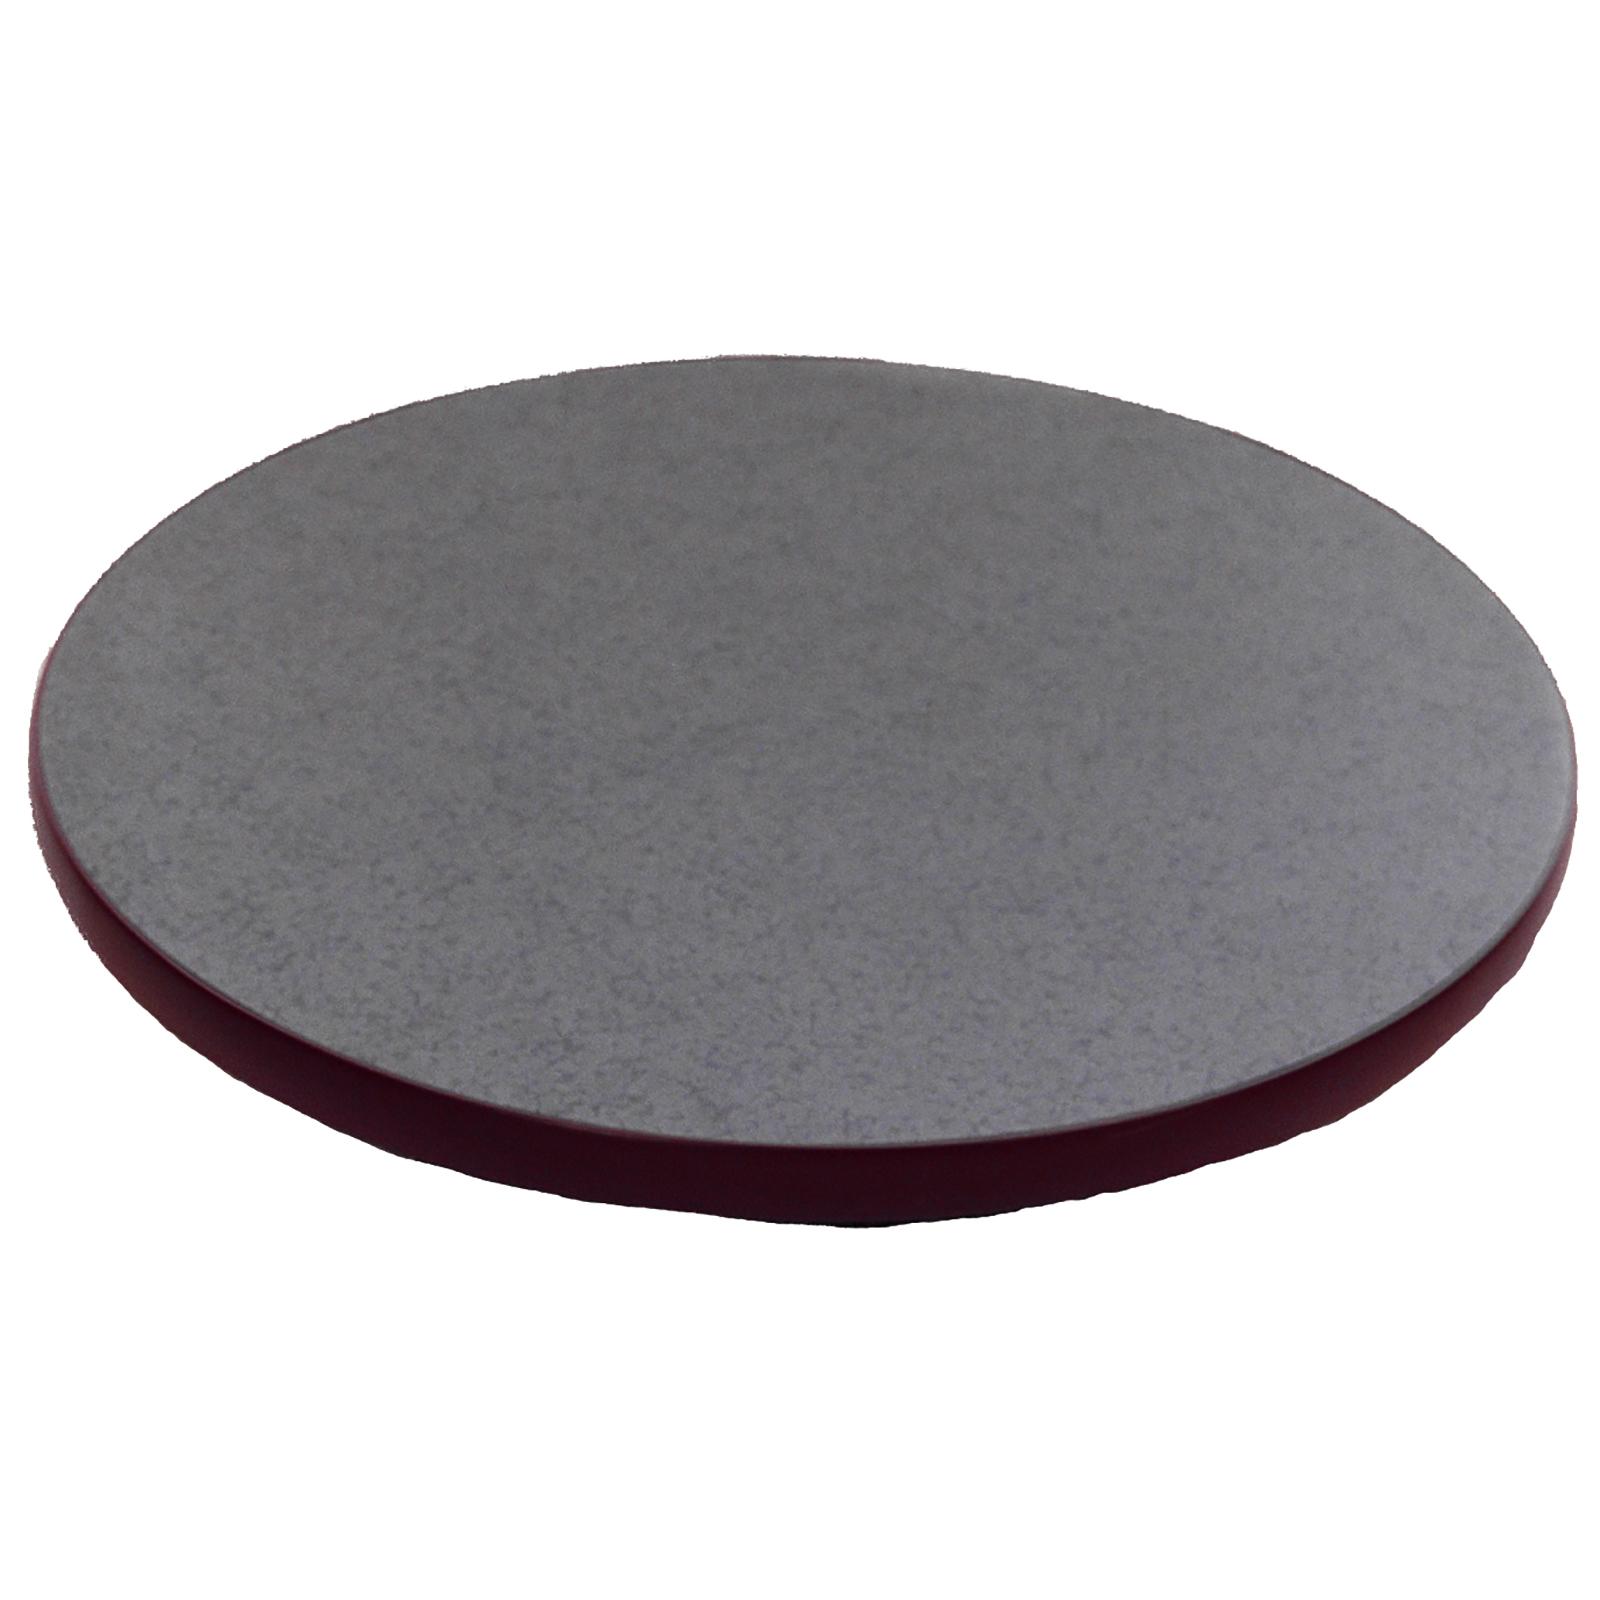 Oak Street CTM3042-2 table top, laminate